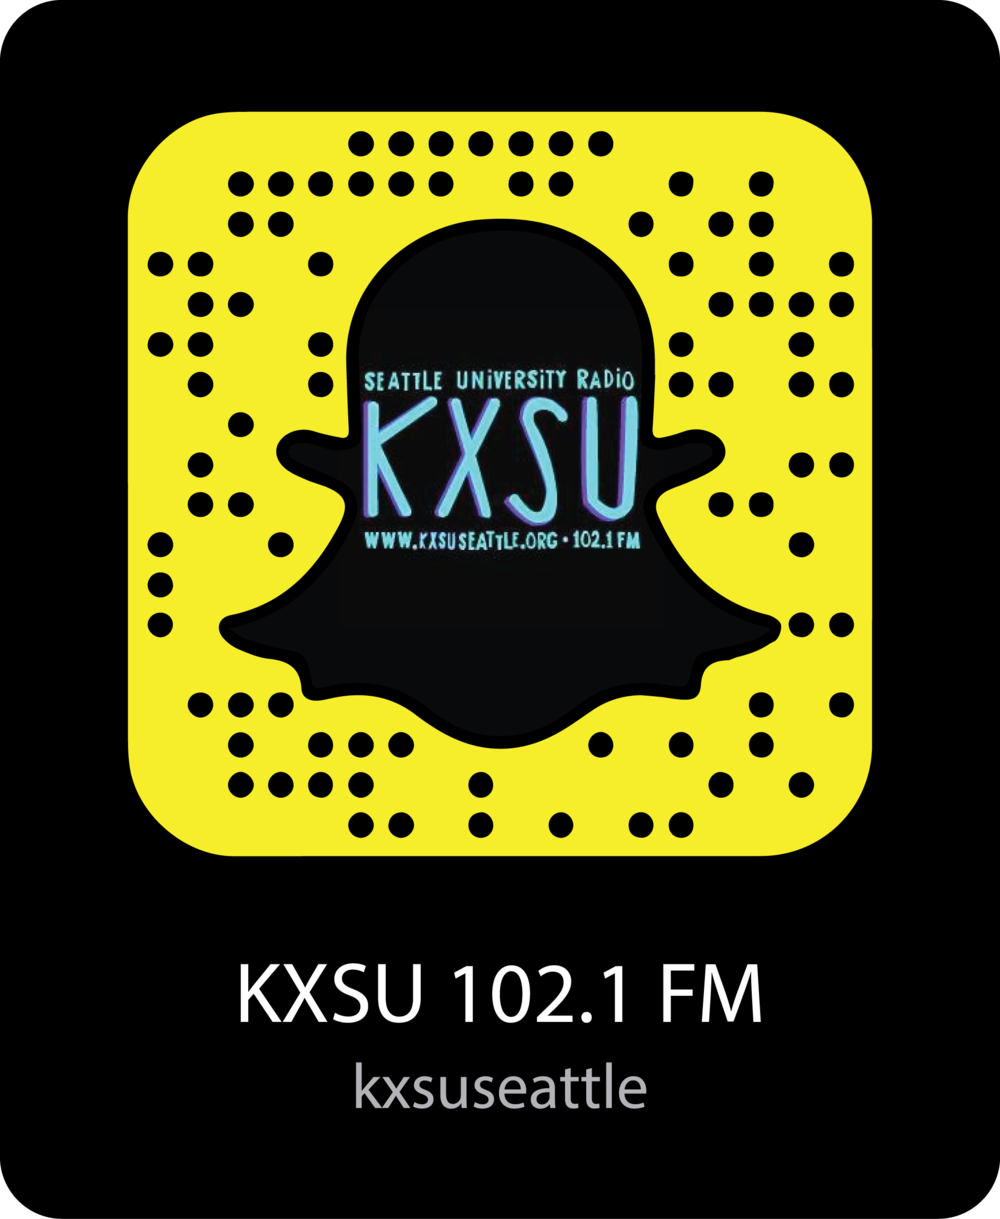 KXSUseattle-snapchat-snapcode.png